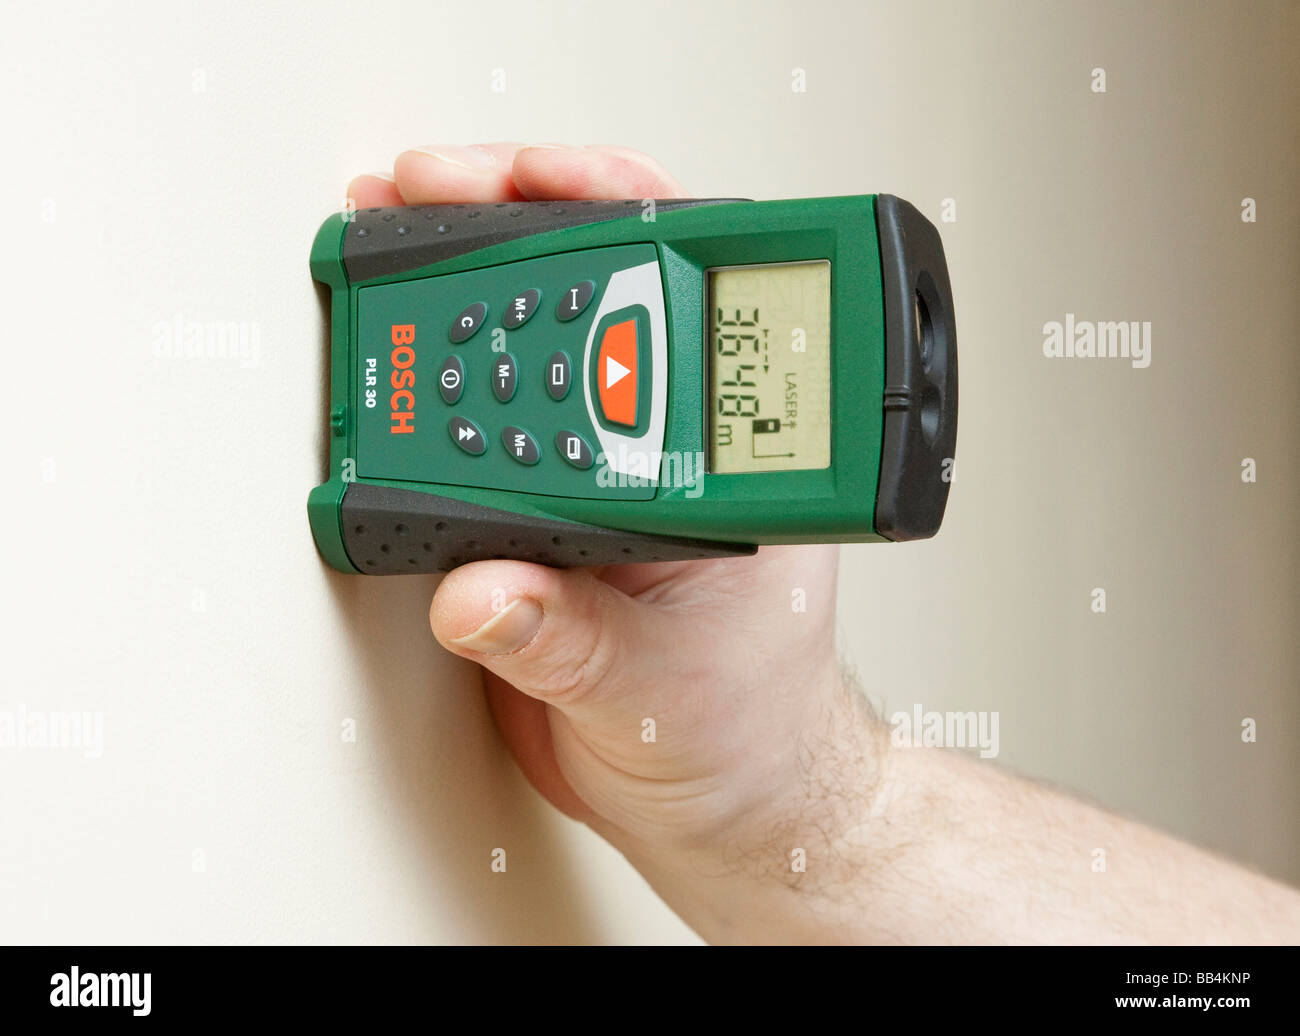 Bosch digital laser rangefinder - Stock Image